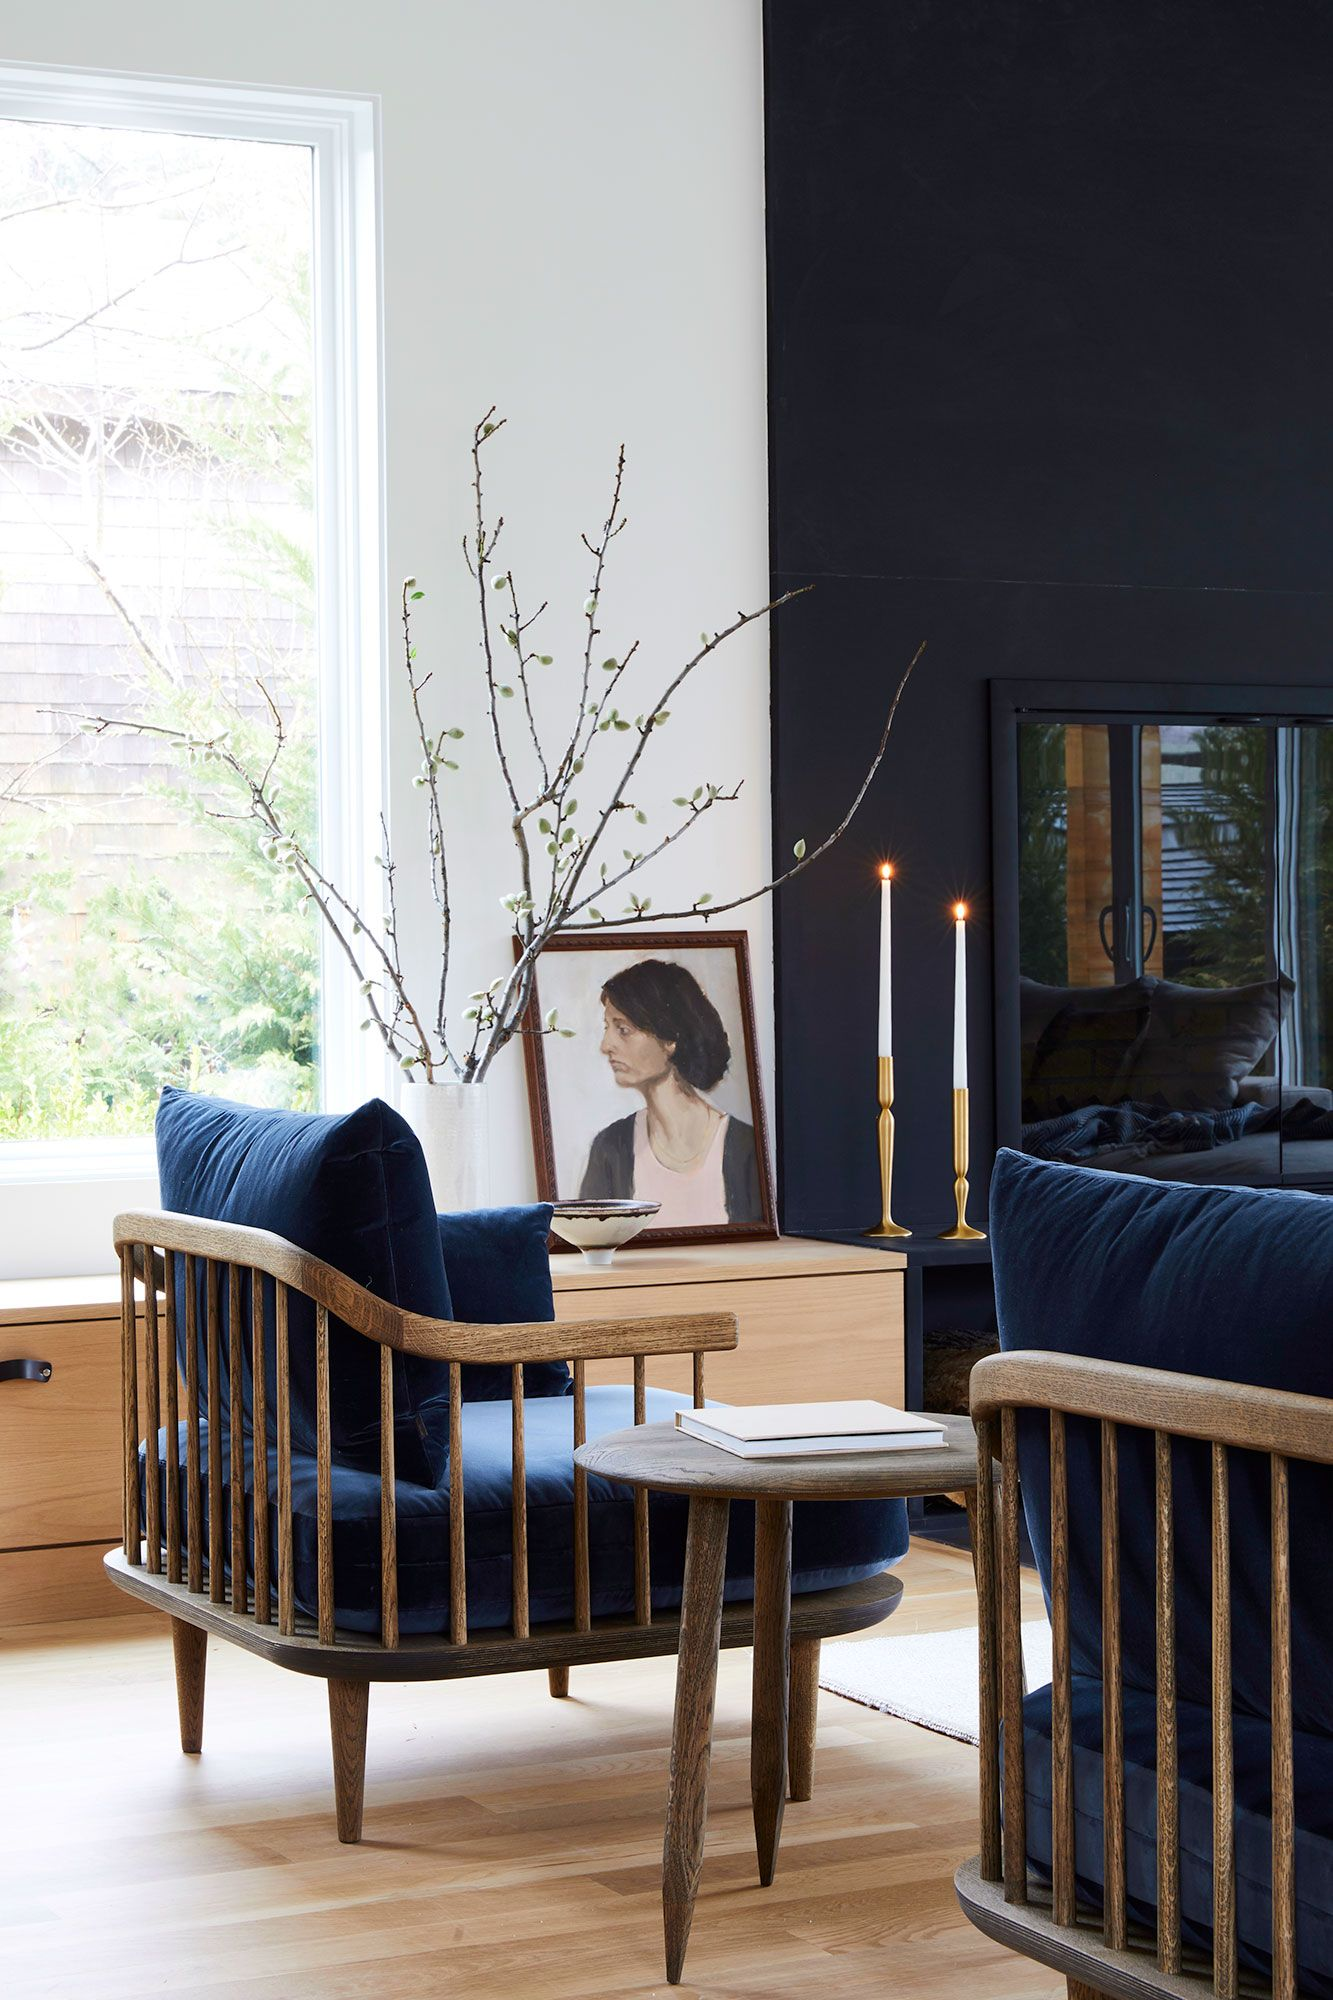 Wohnzimmerstil 2018 pin by hannah i stokes on casa in   pinterest  muebles futura